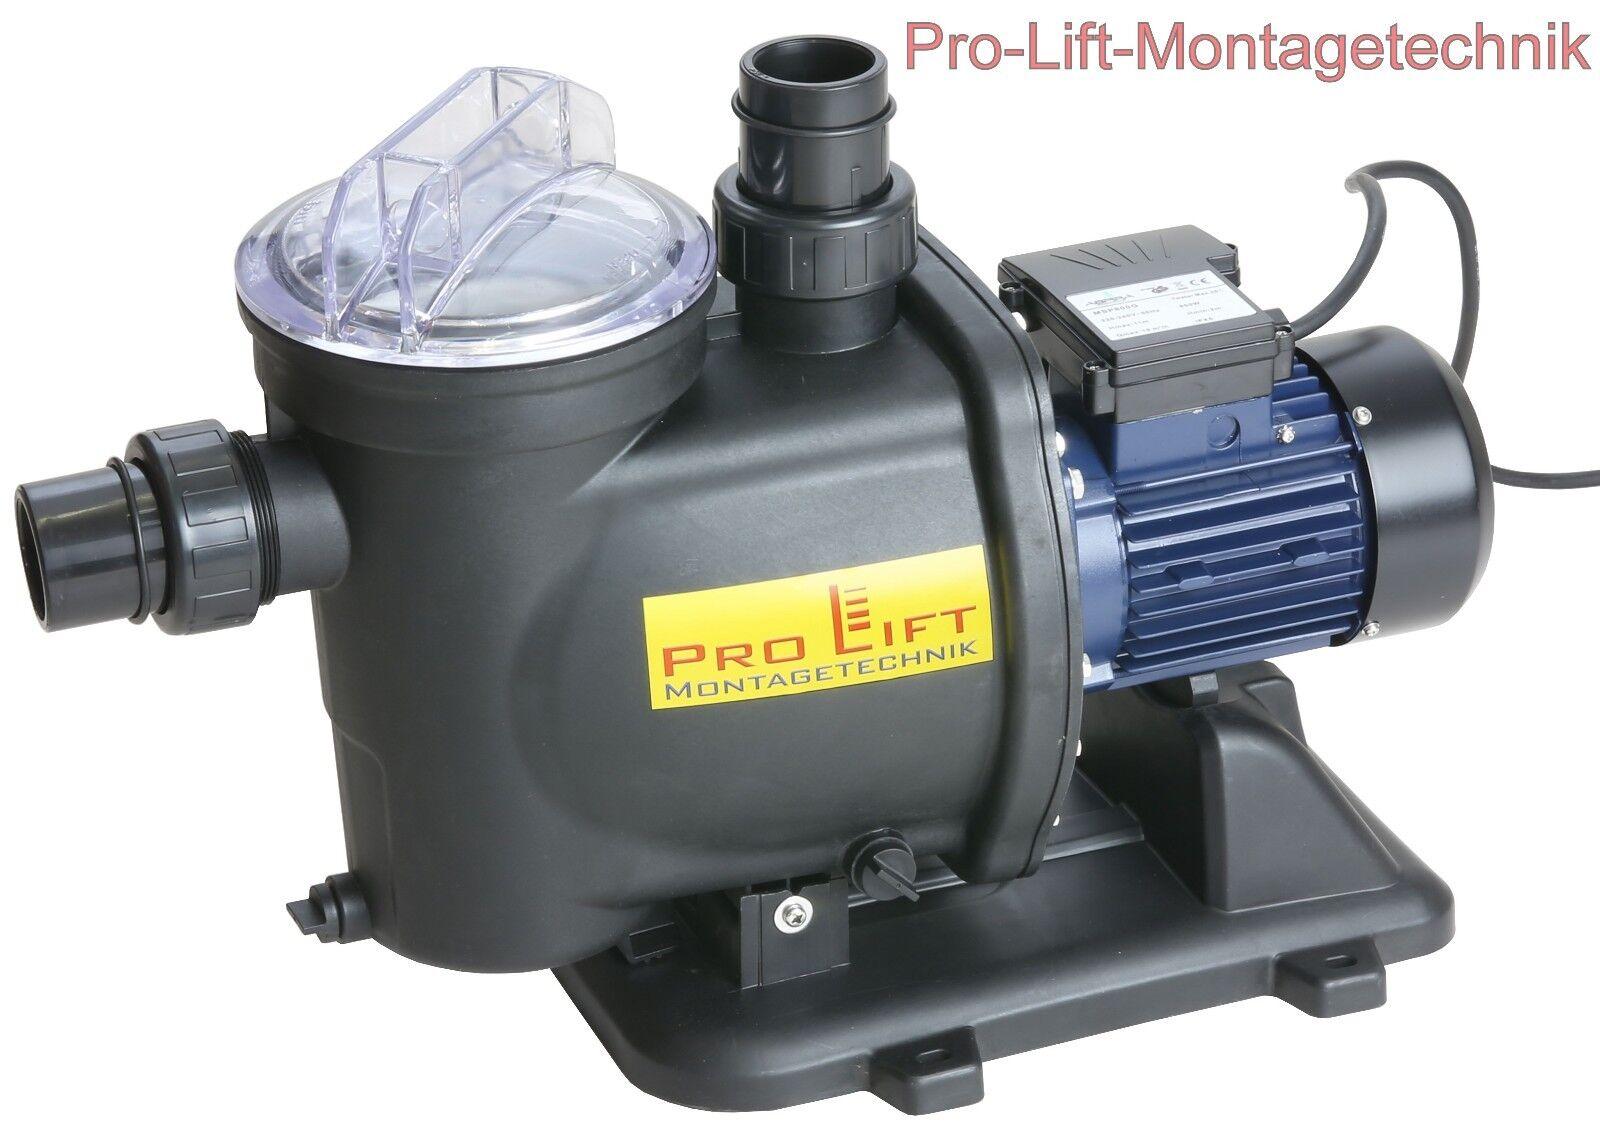 800W Wasserpumpe Schwimmbadpumpe Bewässerungspumpe 19m³ h Pumpe  MSP800GJ  02277